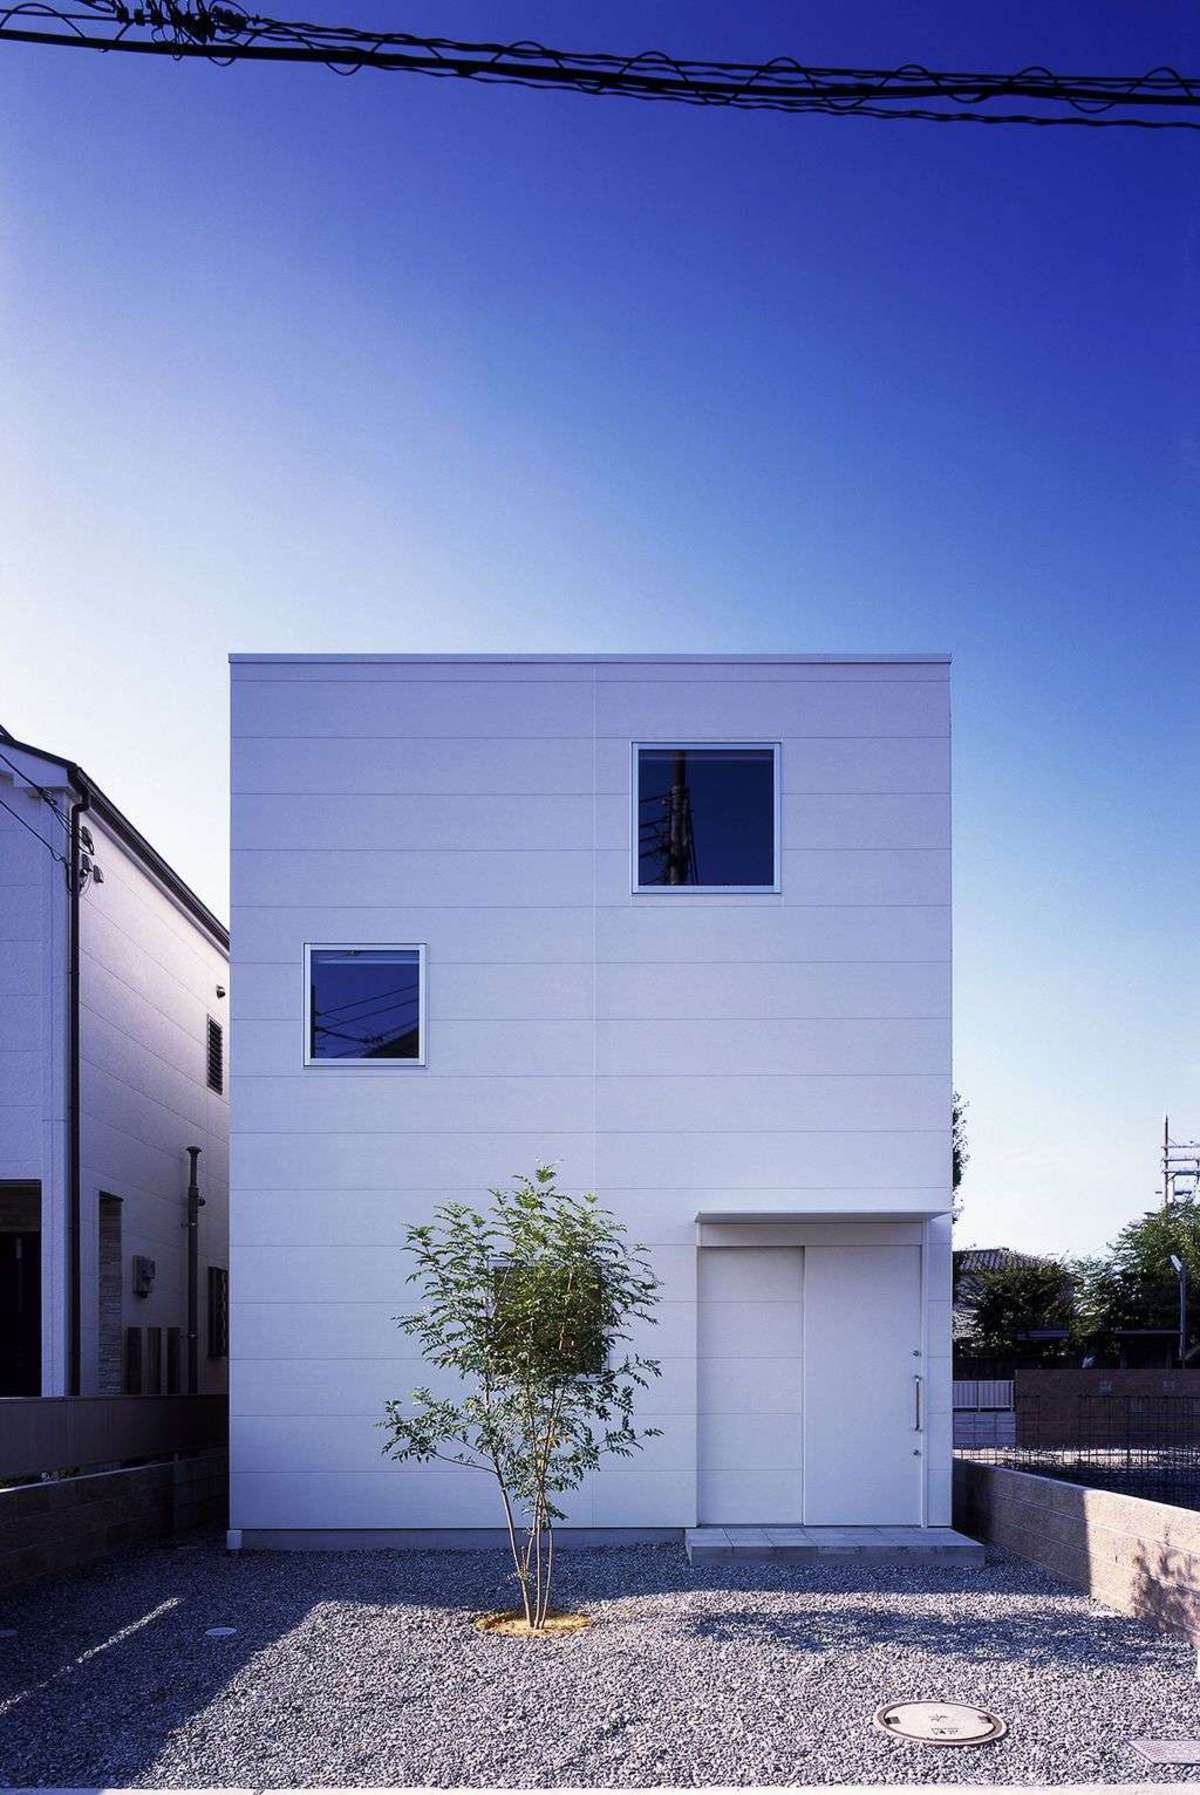 Giappone cosa vedere le case in citta floornature for Giappone case